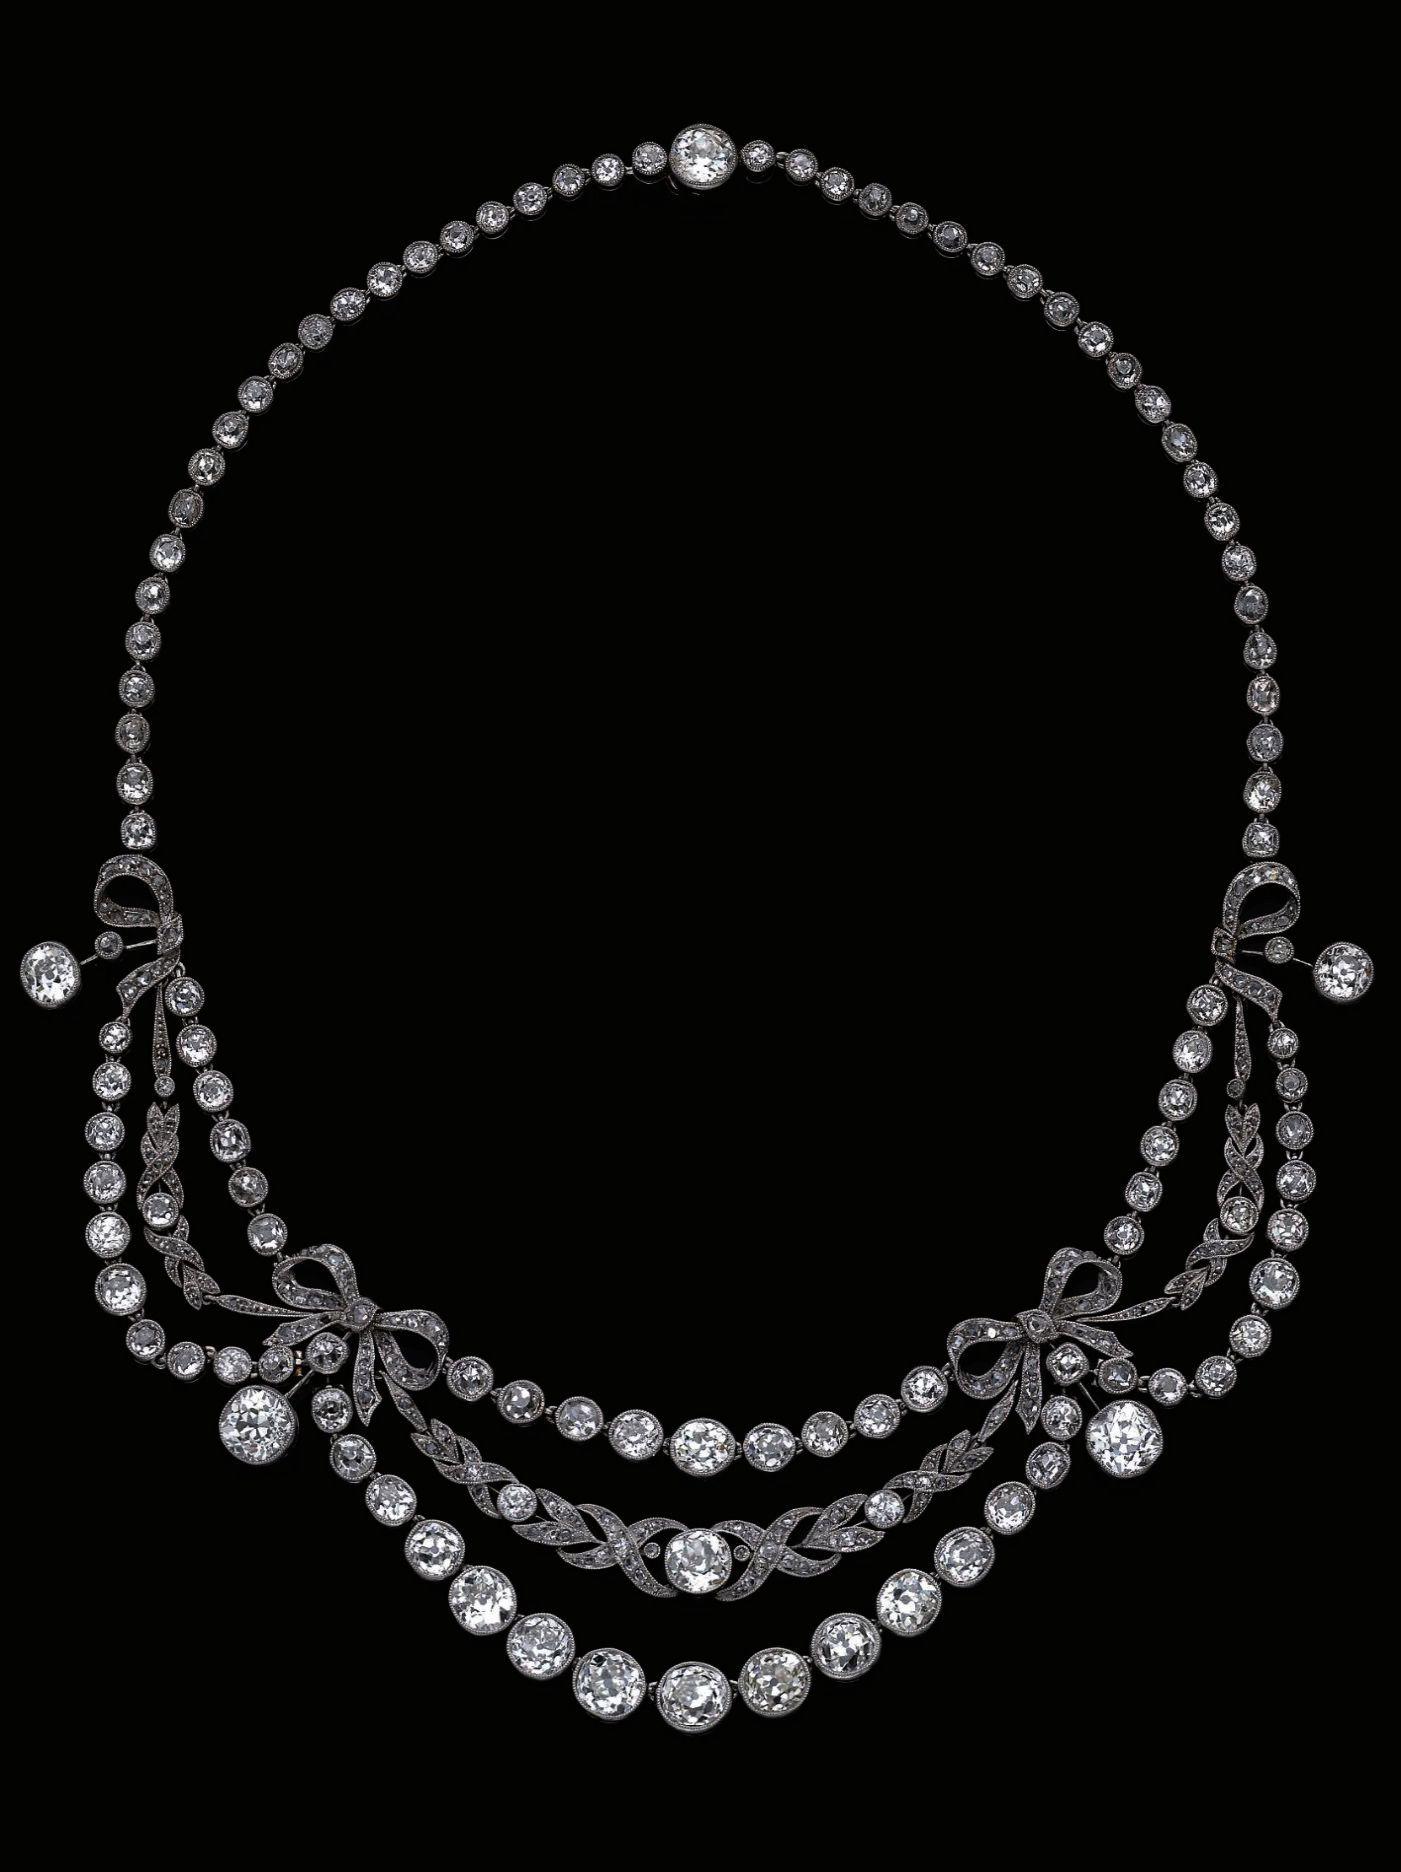 Jade Jewelry Store Near Me all Diamond Cross Necklace